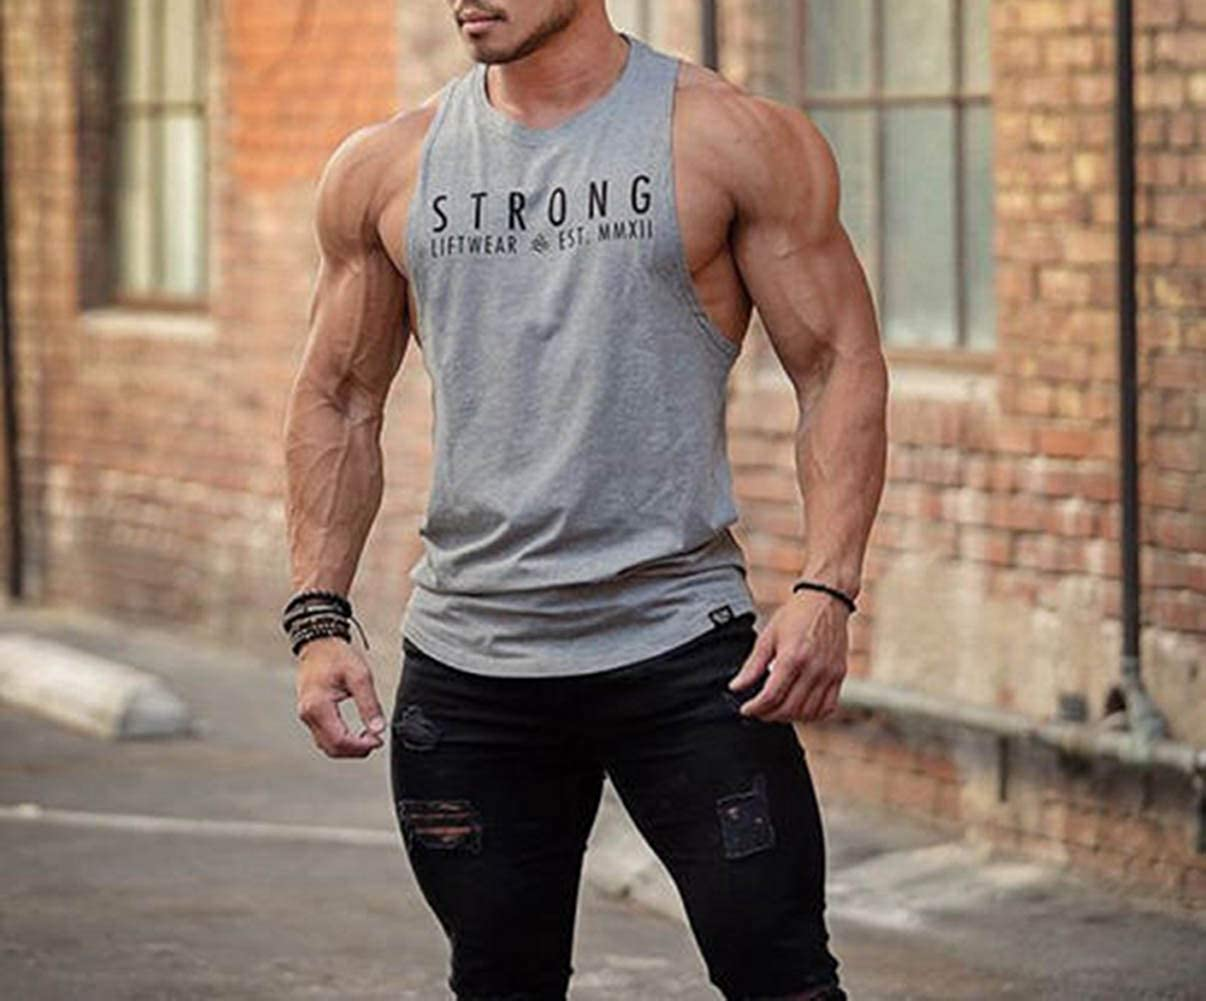 Herren Gym-Weste Fitness Tank Top Muskel Fit Ärmelloses T-Shirt Sport Freizeit